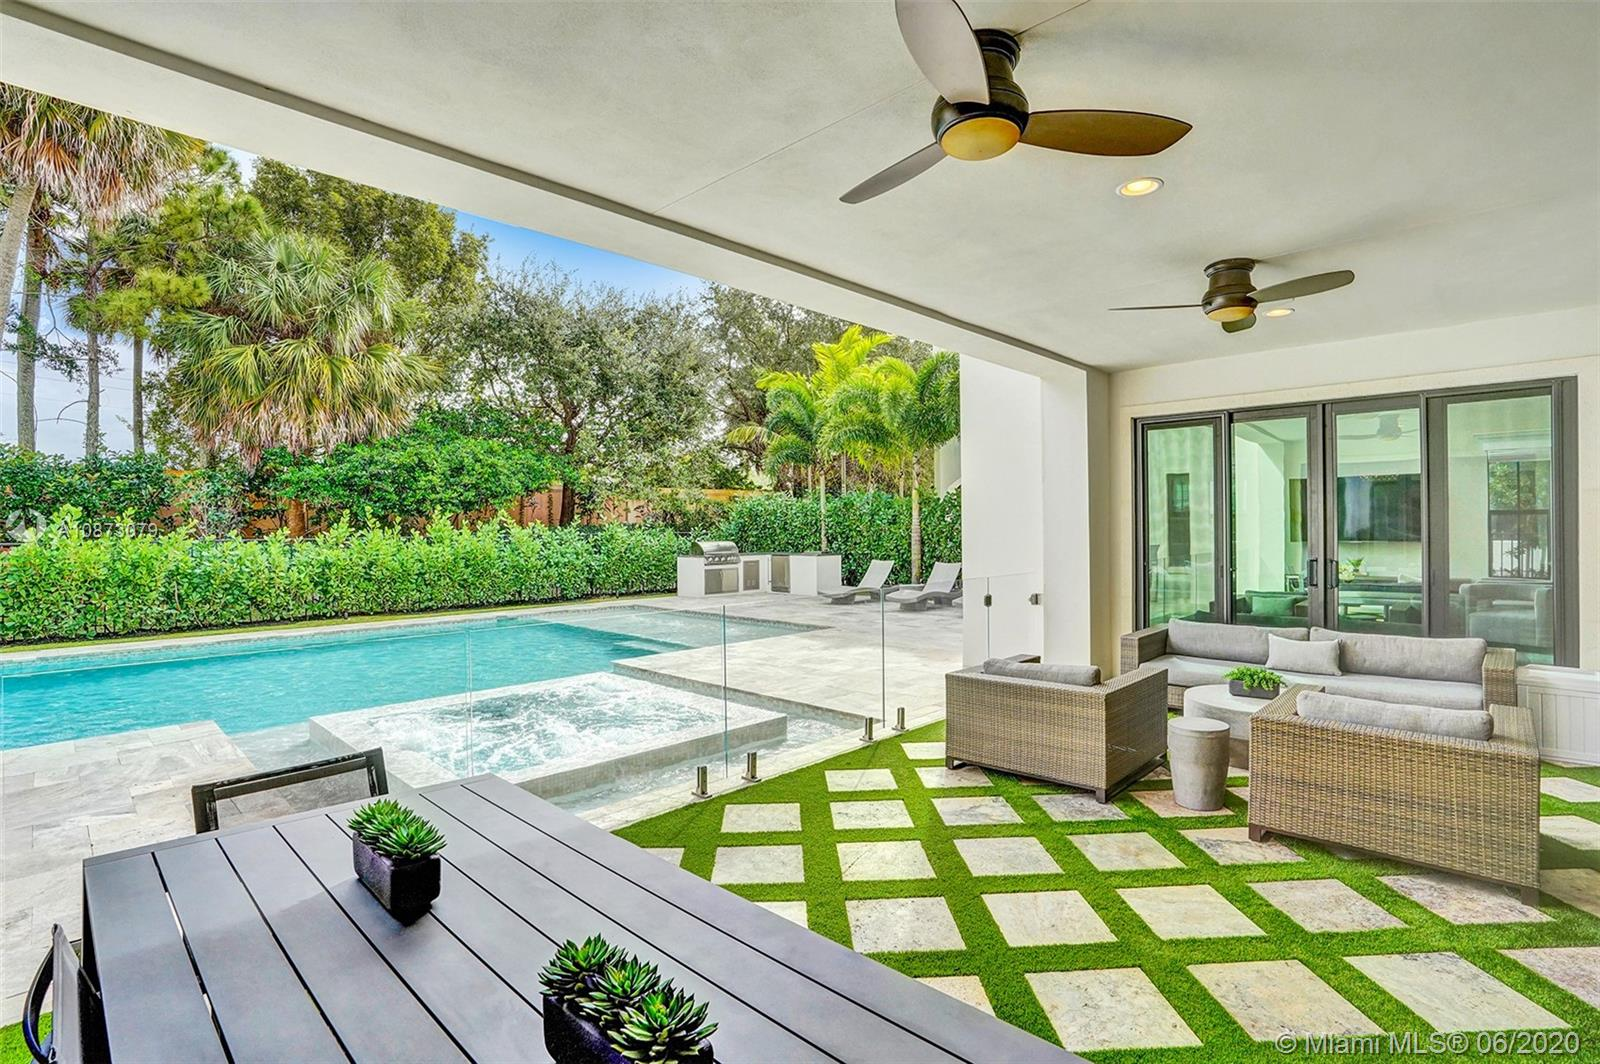 17678 Cadena Dr Property Photo - Boca Raton, FL real estate listing